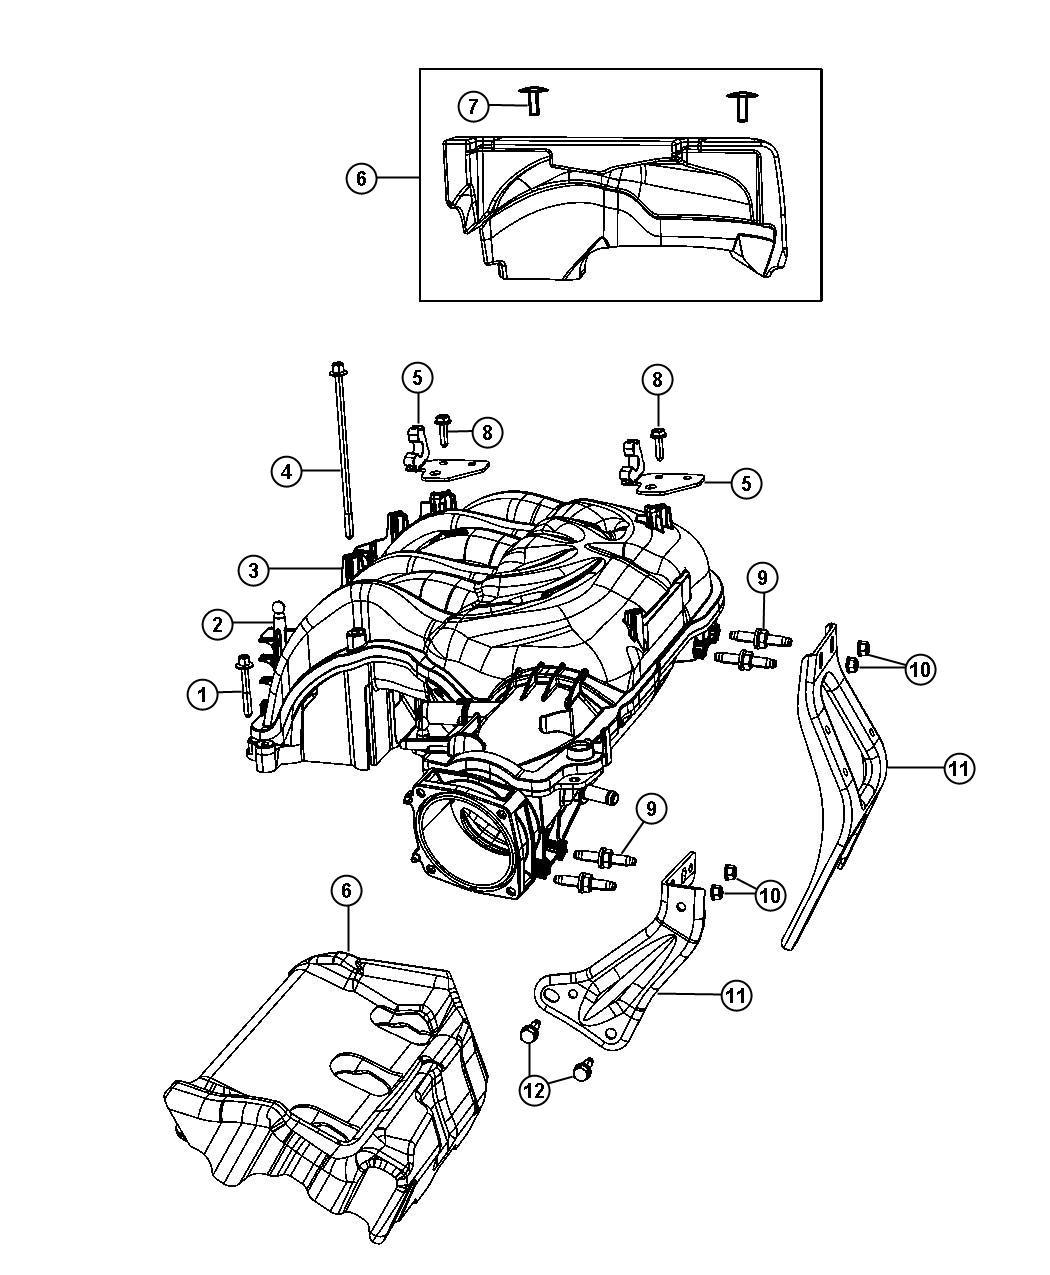 Jeep Wrangler Pad Engine Rear Rear Upper Top Of Intake